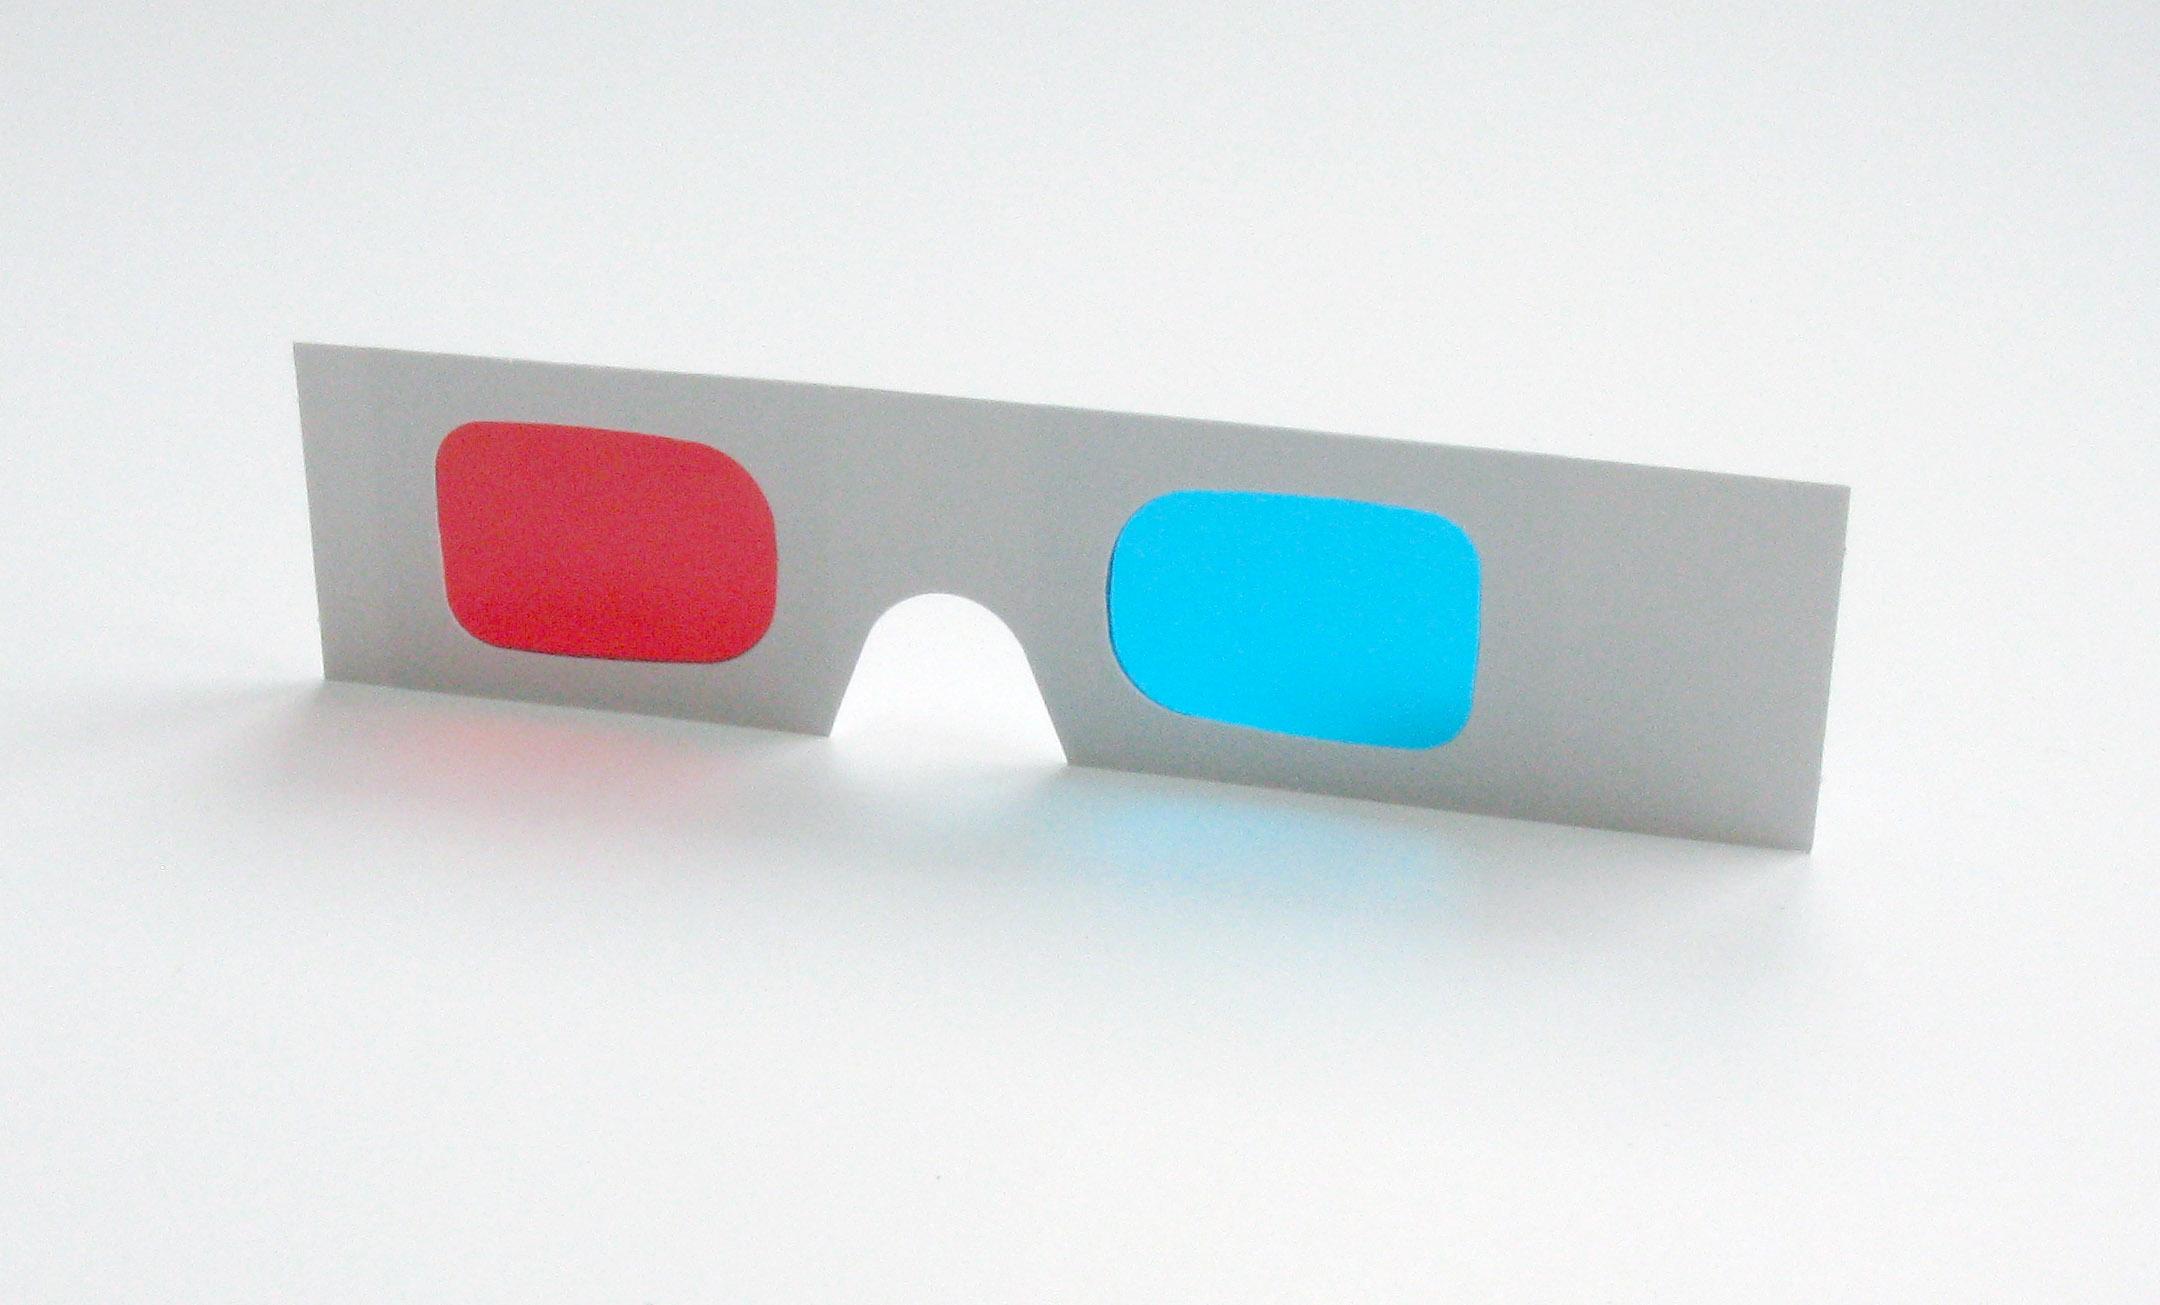 e5041634019675 Rood cyaan kartonnen 3D brillen in de hand